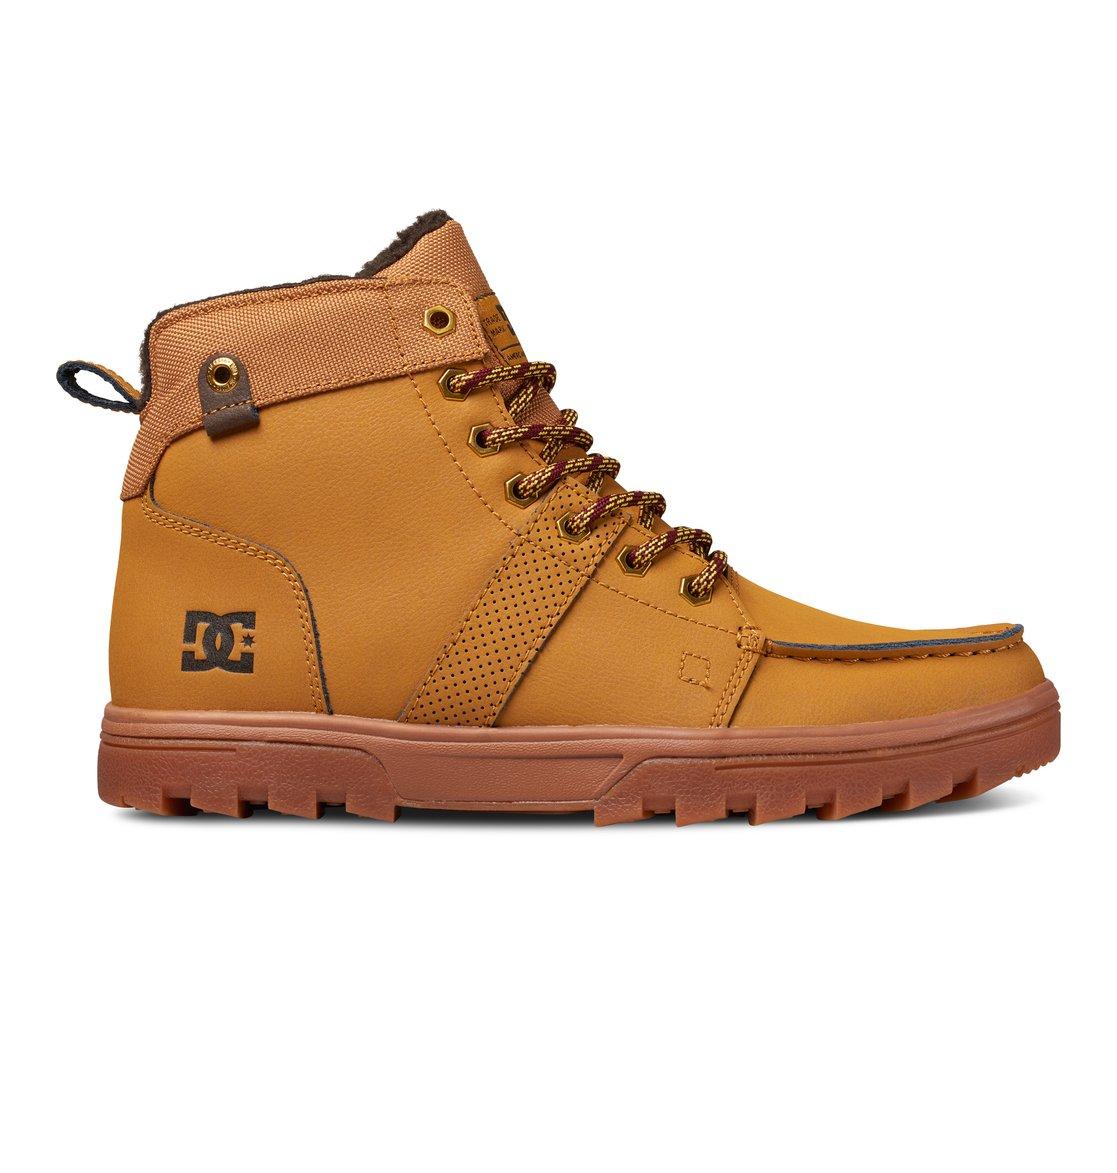 DC Shoesu2122 Menu0026#39;s High Top Outdoor Shoes - Woodland 303241 ...